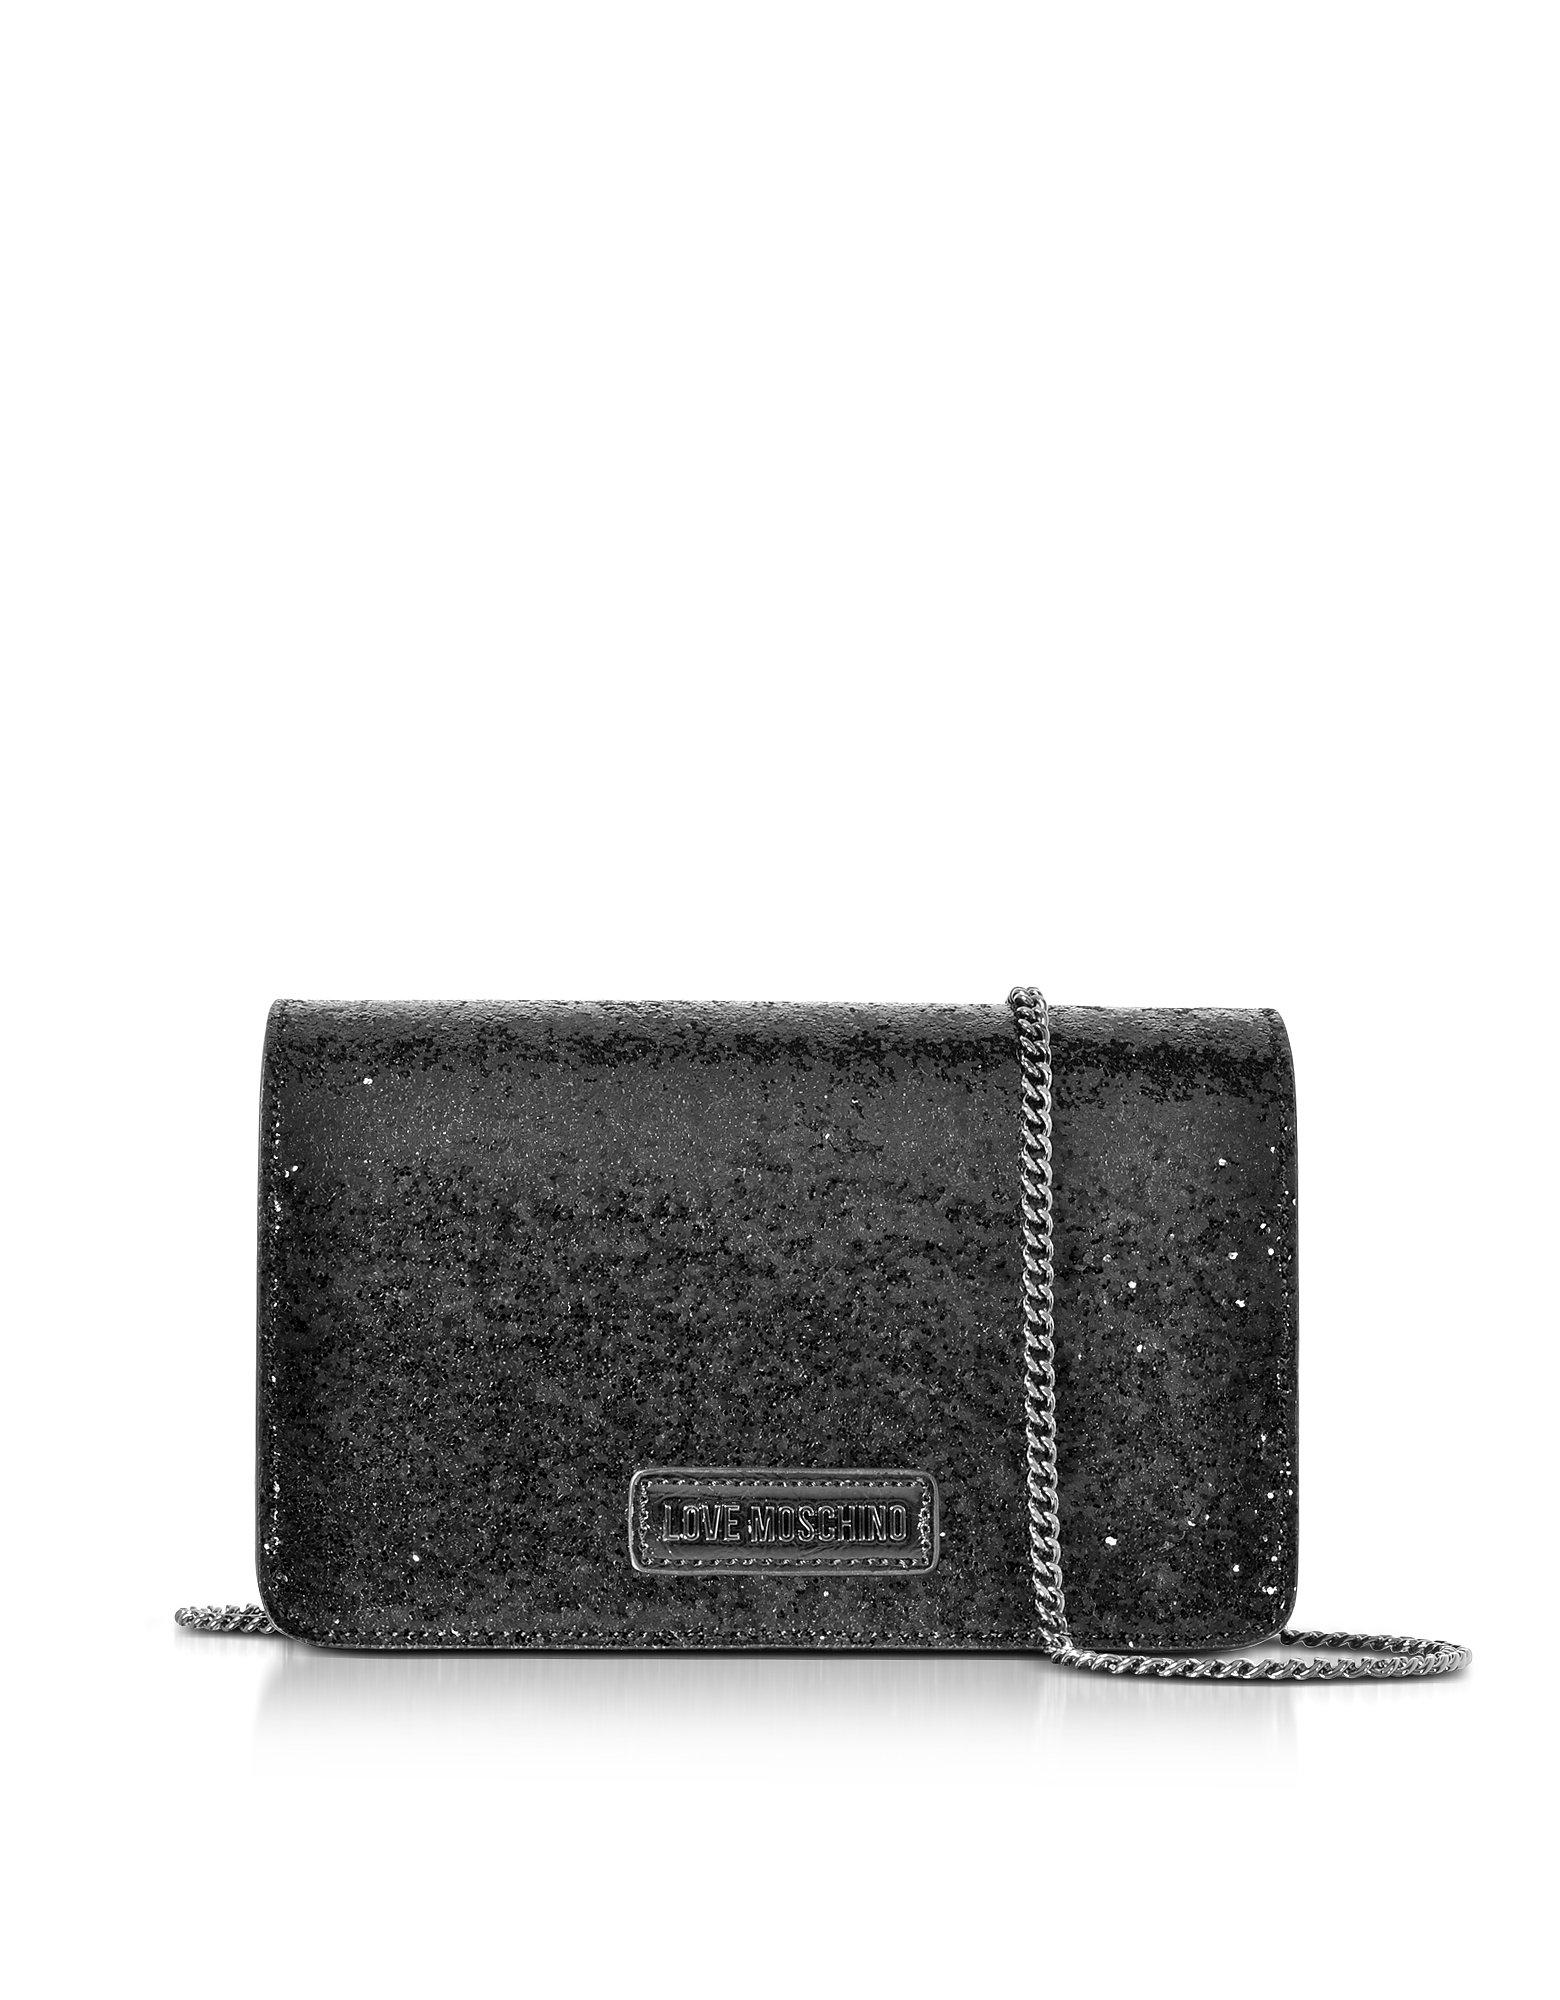 Love Moschino Women's Jc4091pp15ll0000 Black Leather Shoulder Bag